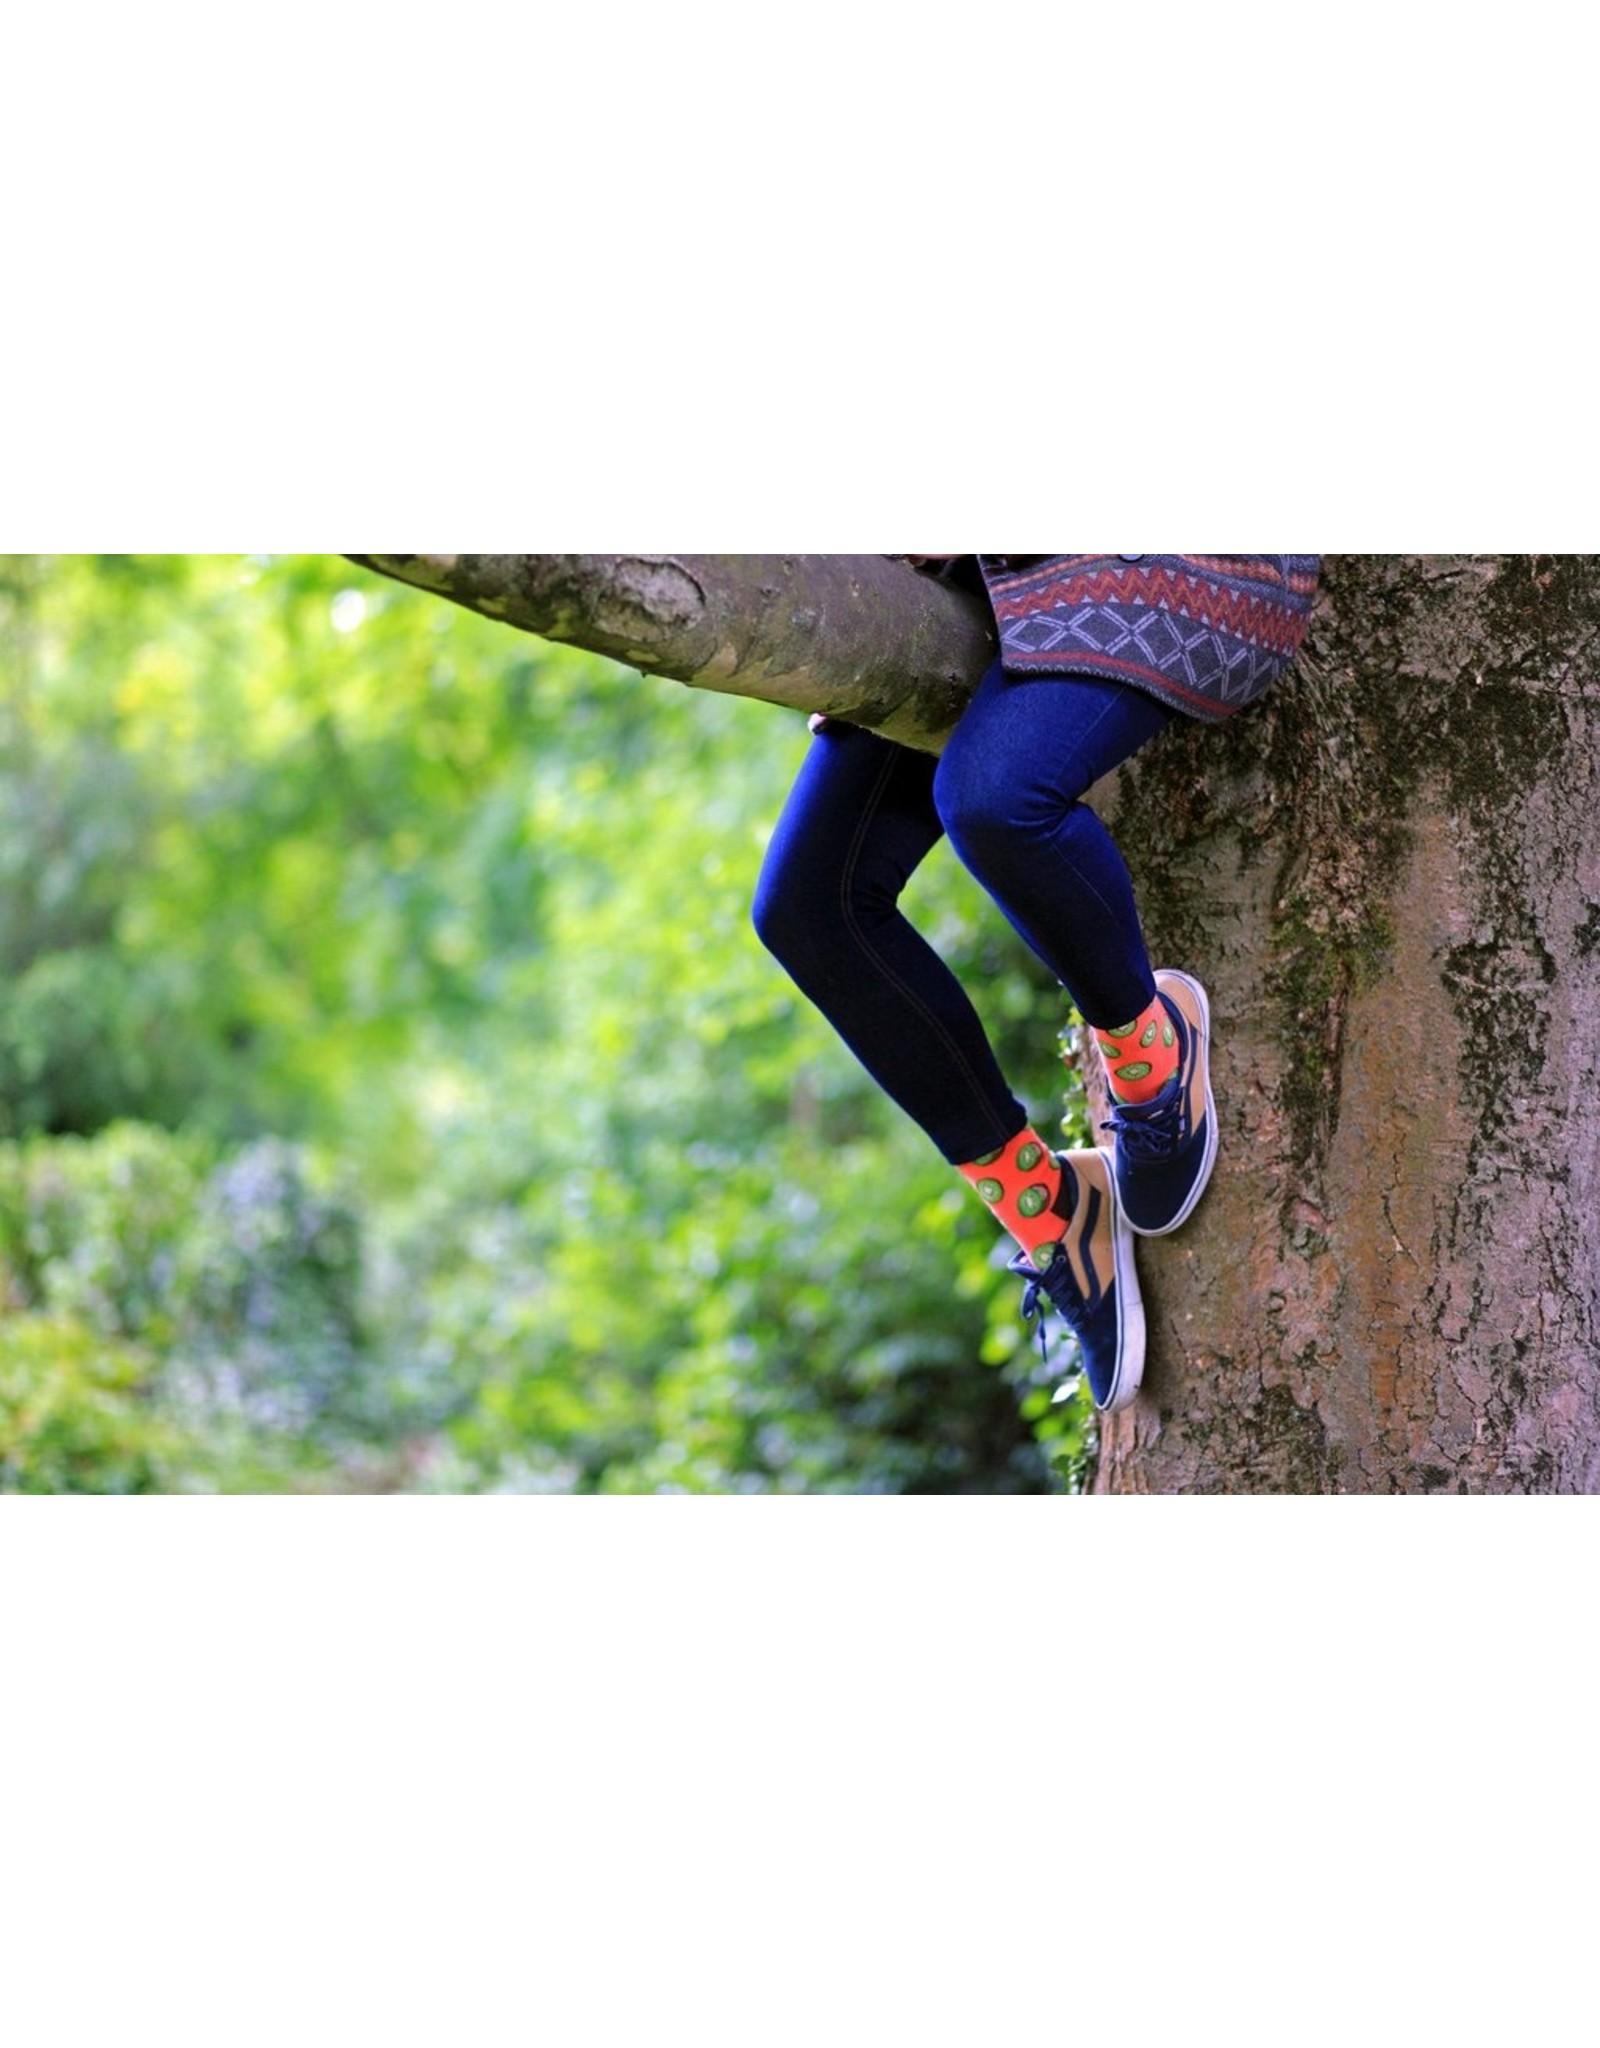 Moustard socks - kiwi (41-46)